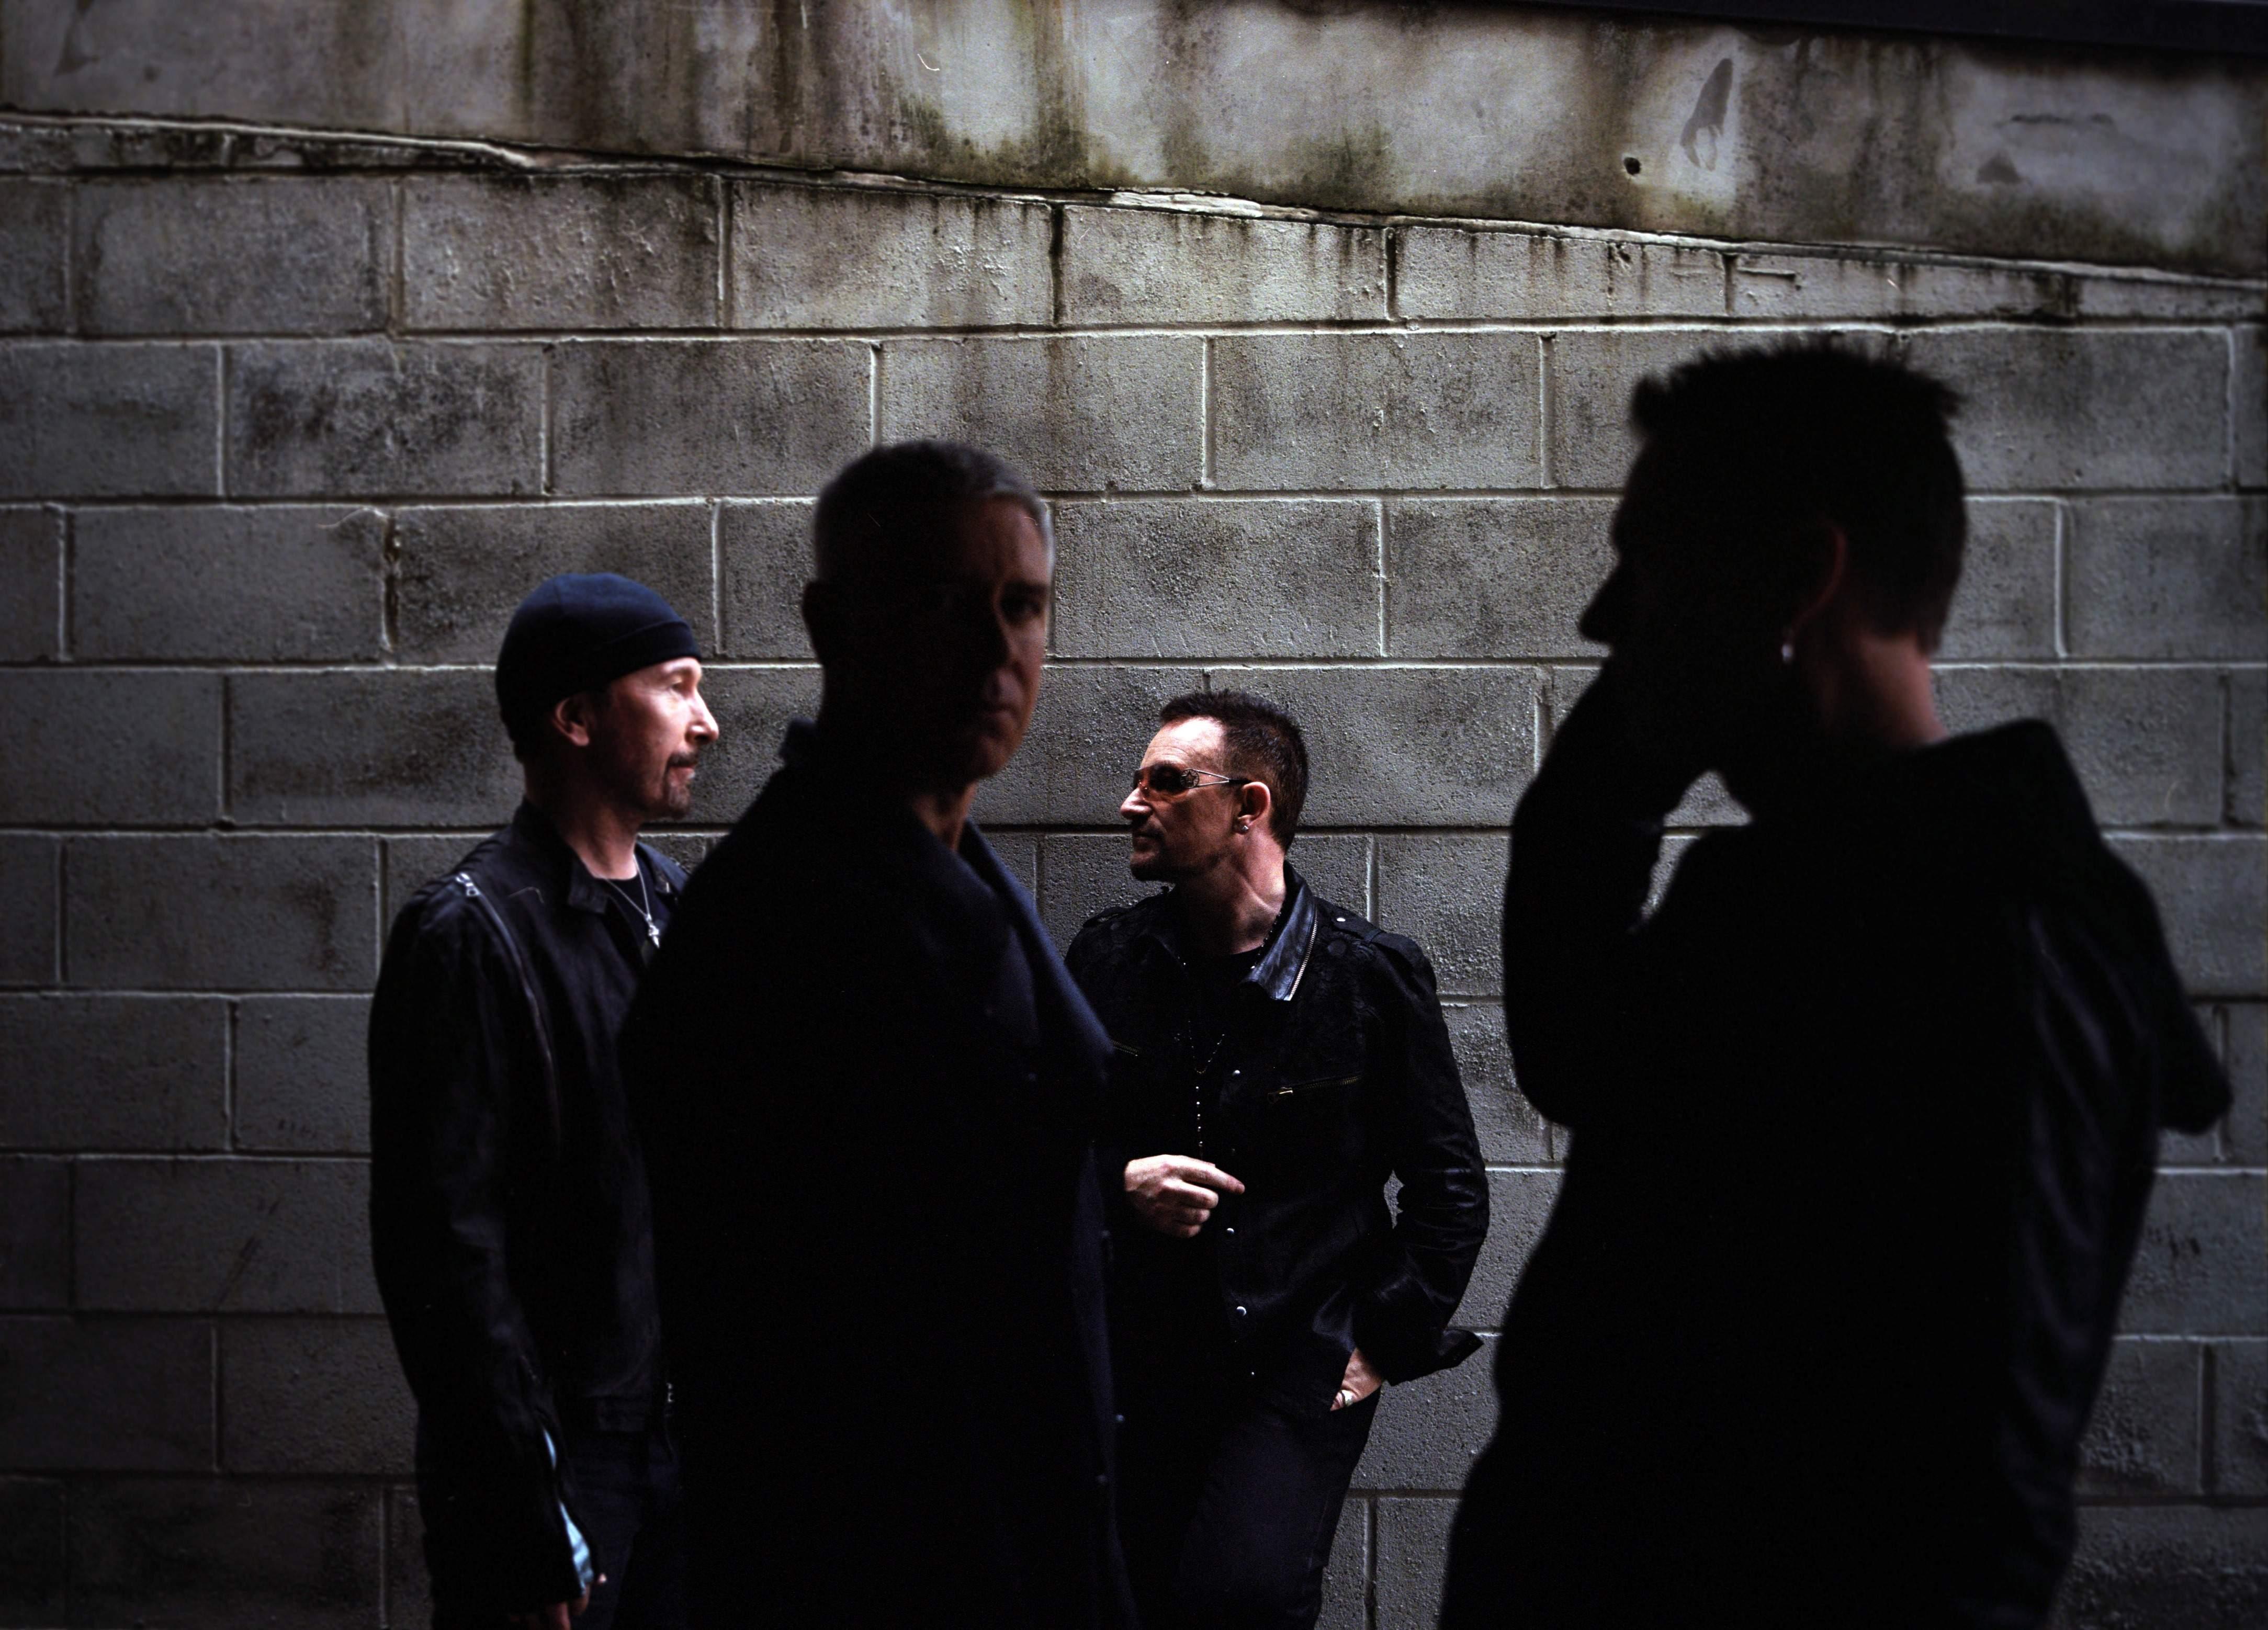 U2 to Receive The Sonny Bono Visionary Award